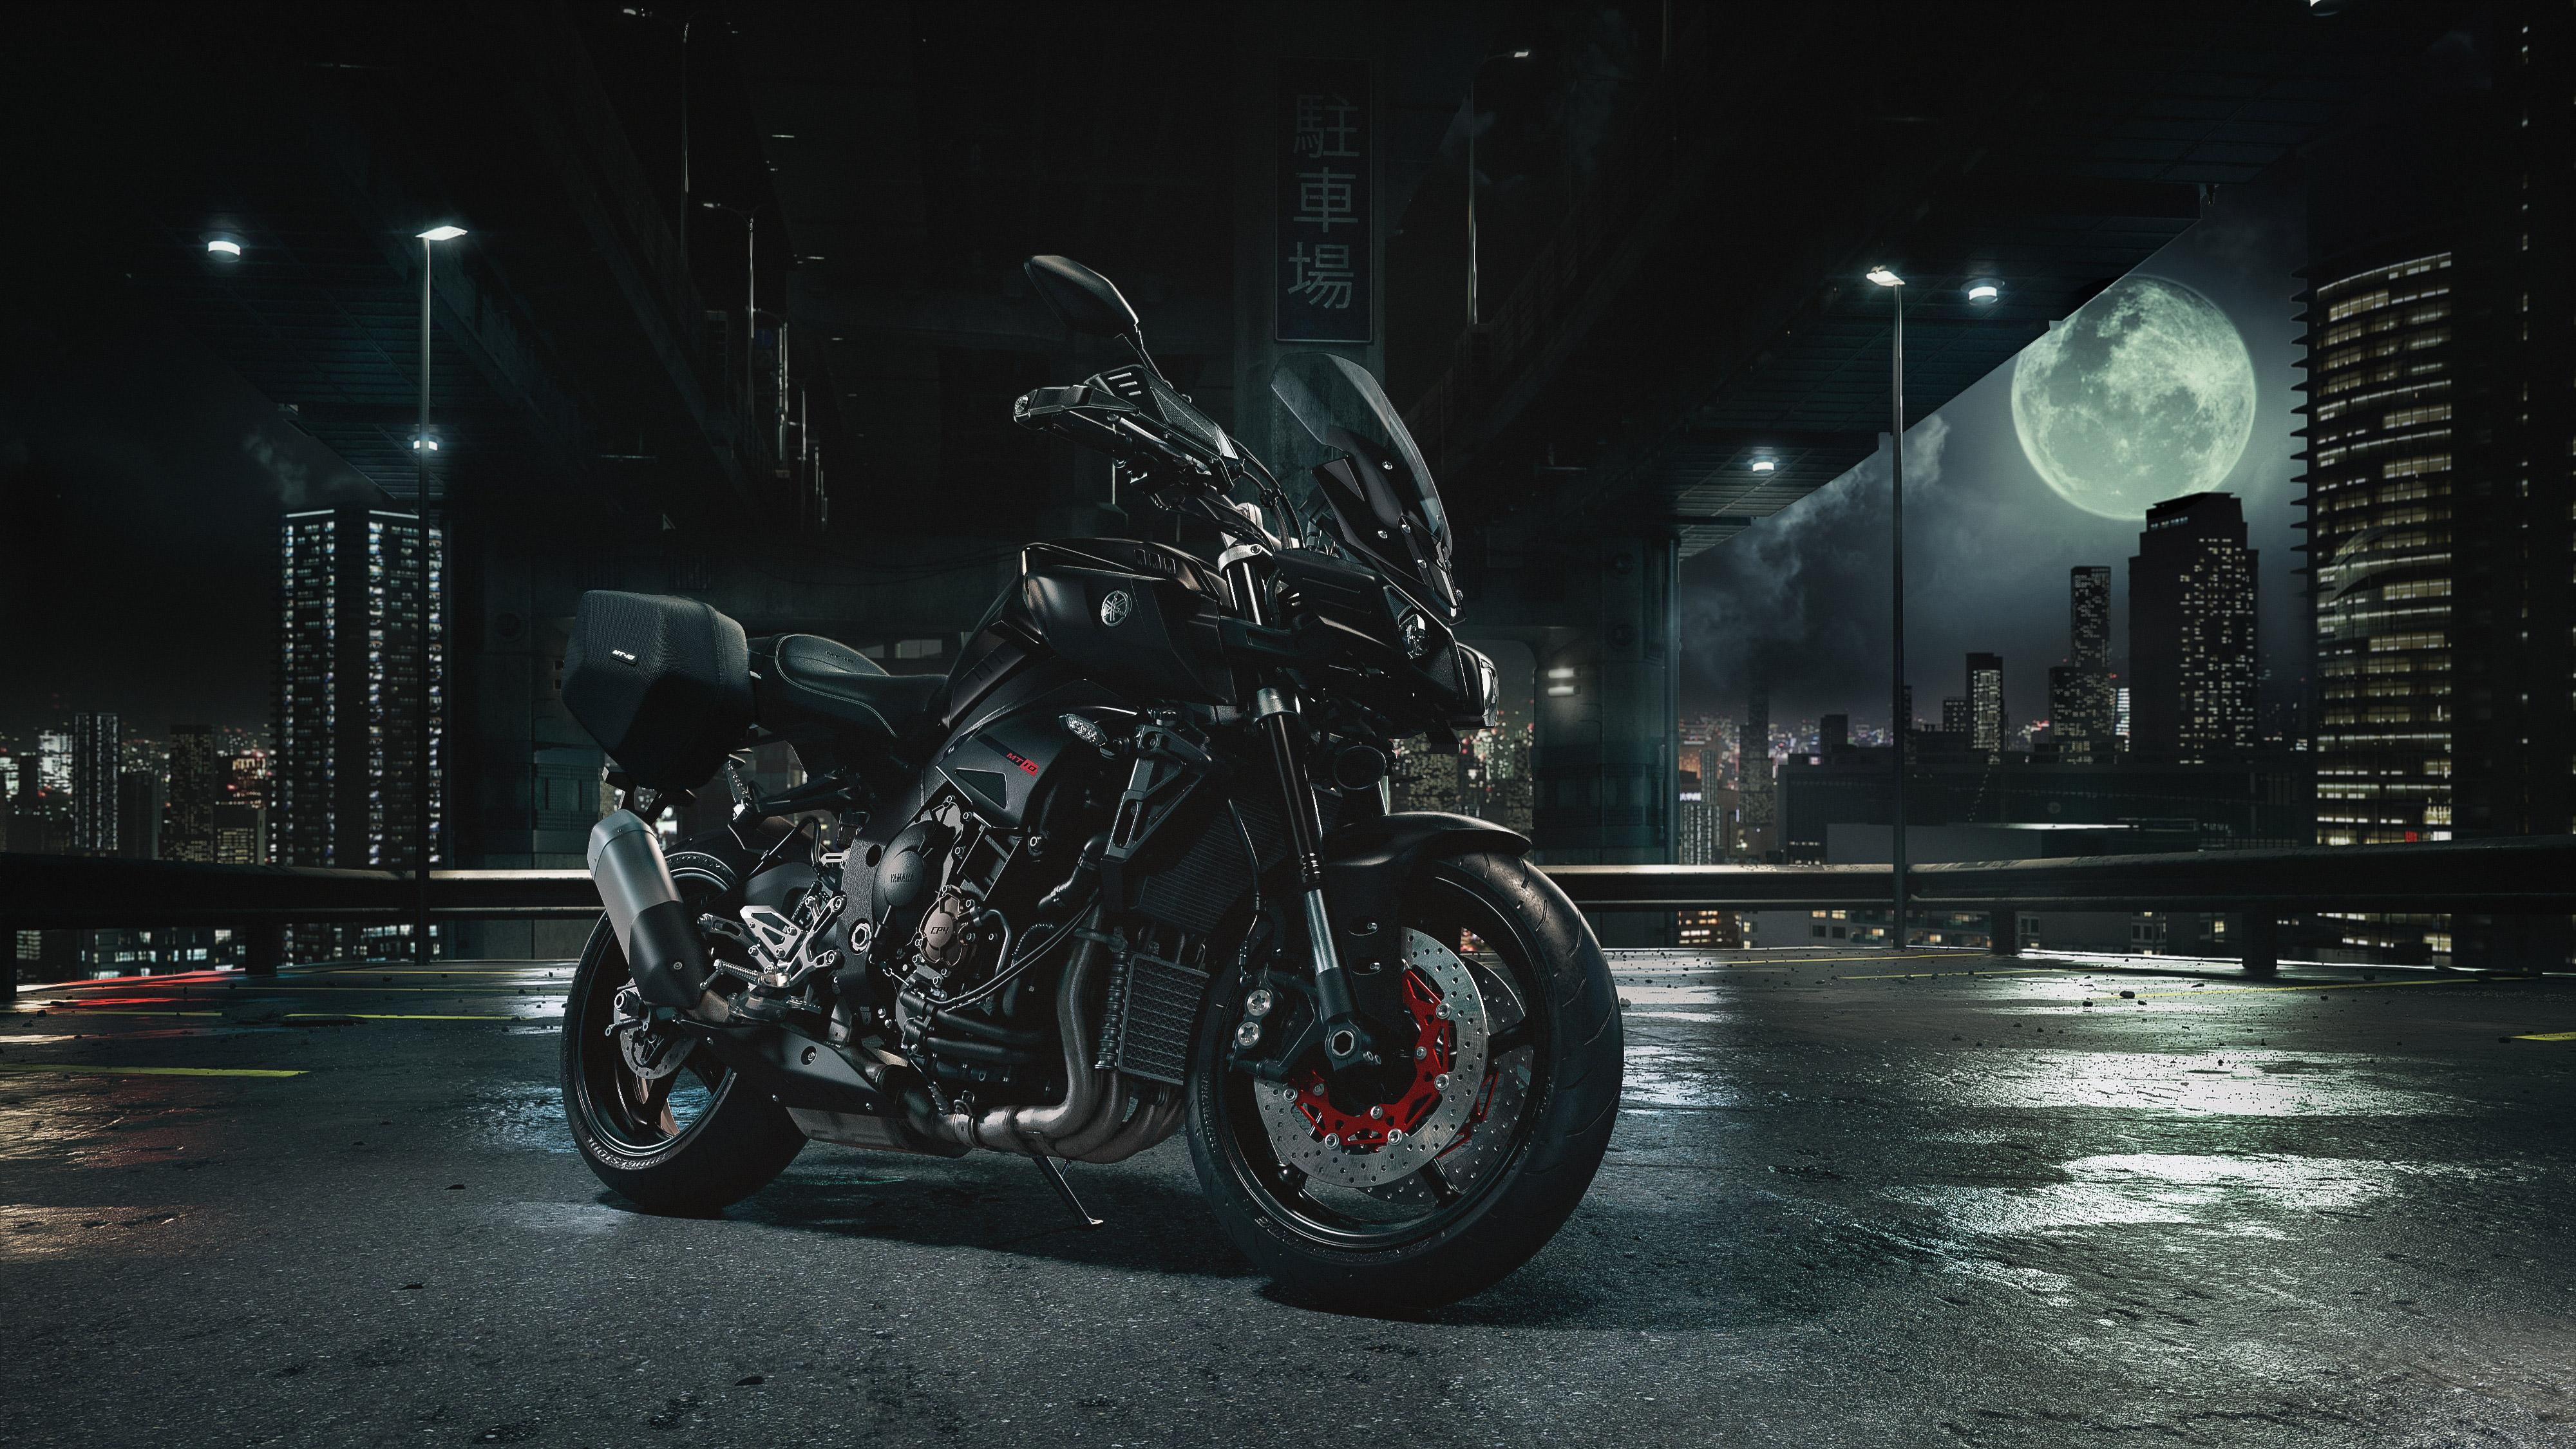 Yamaha MT 10 2017, HD Bikes, 4k Wallpapers, Images